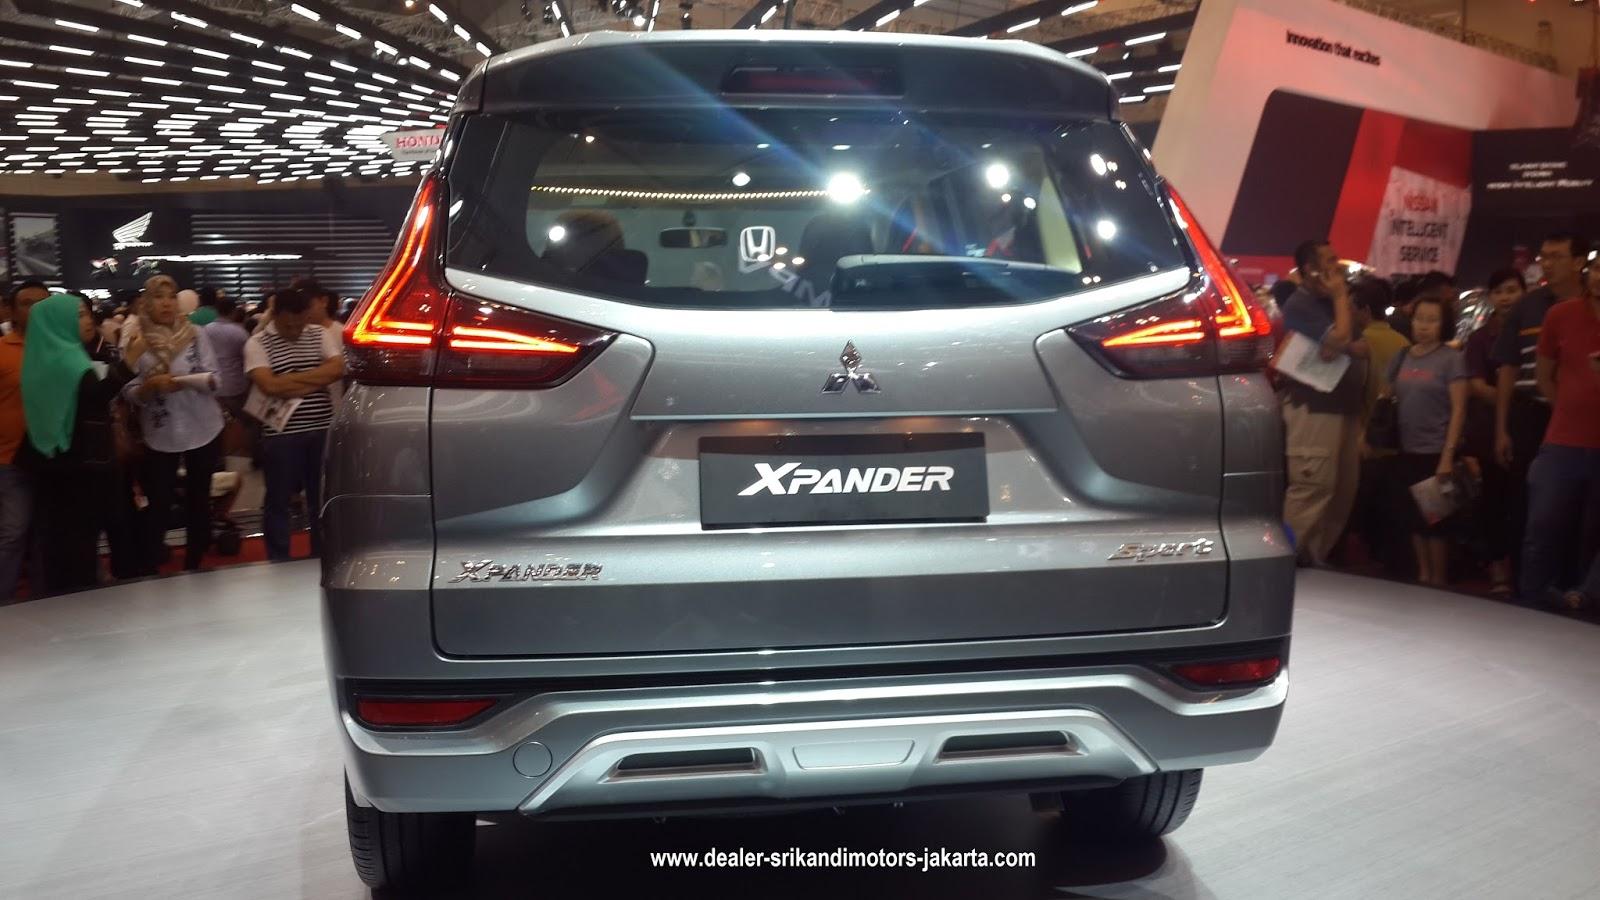 Harga All New Vellfire 2018 Berat Grand Veloz Varian Mitsubishi Xpander Dealer